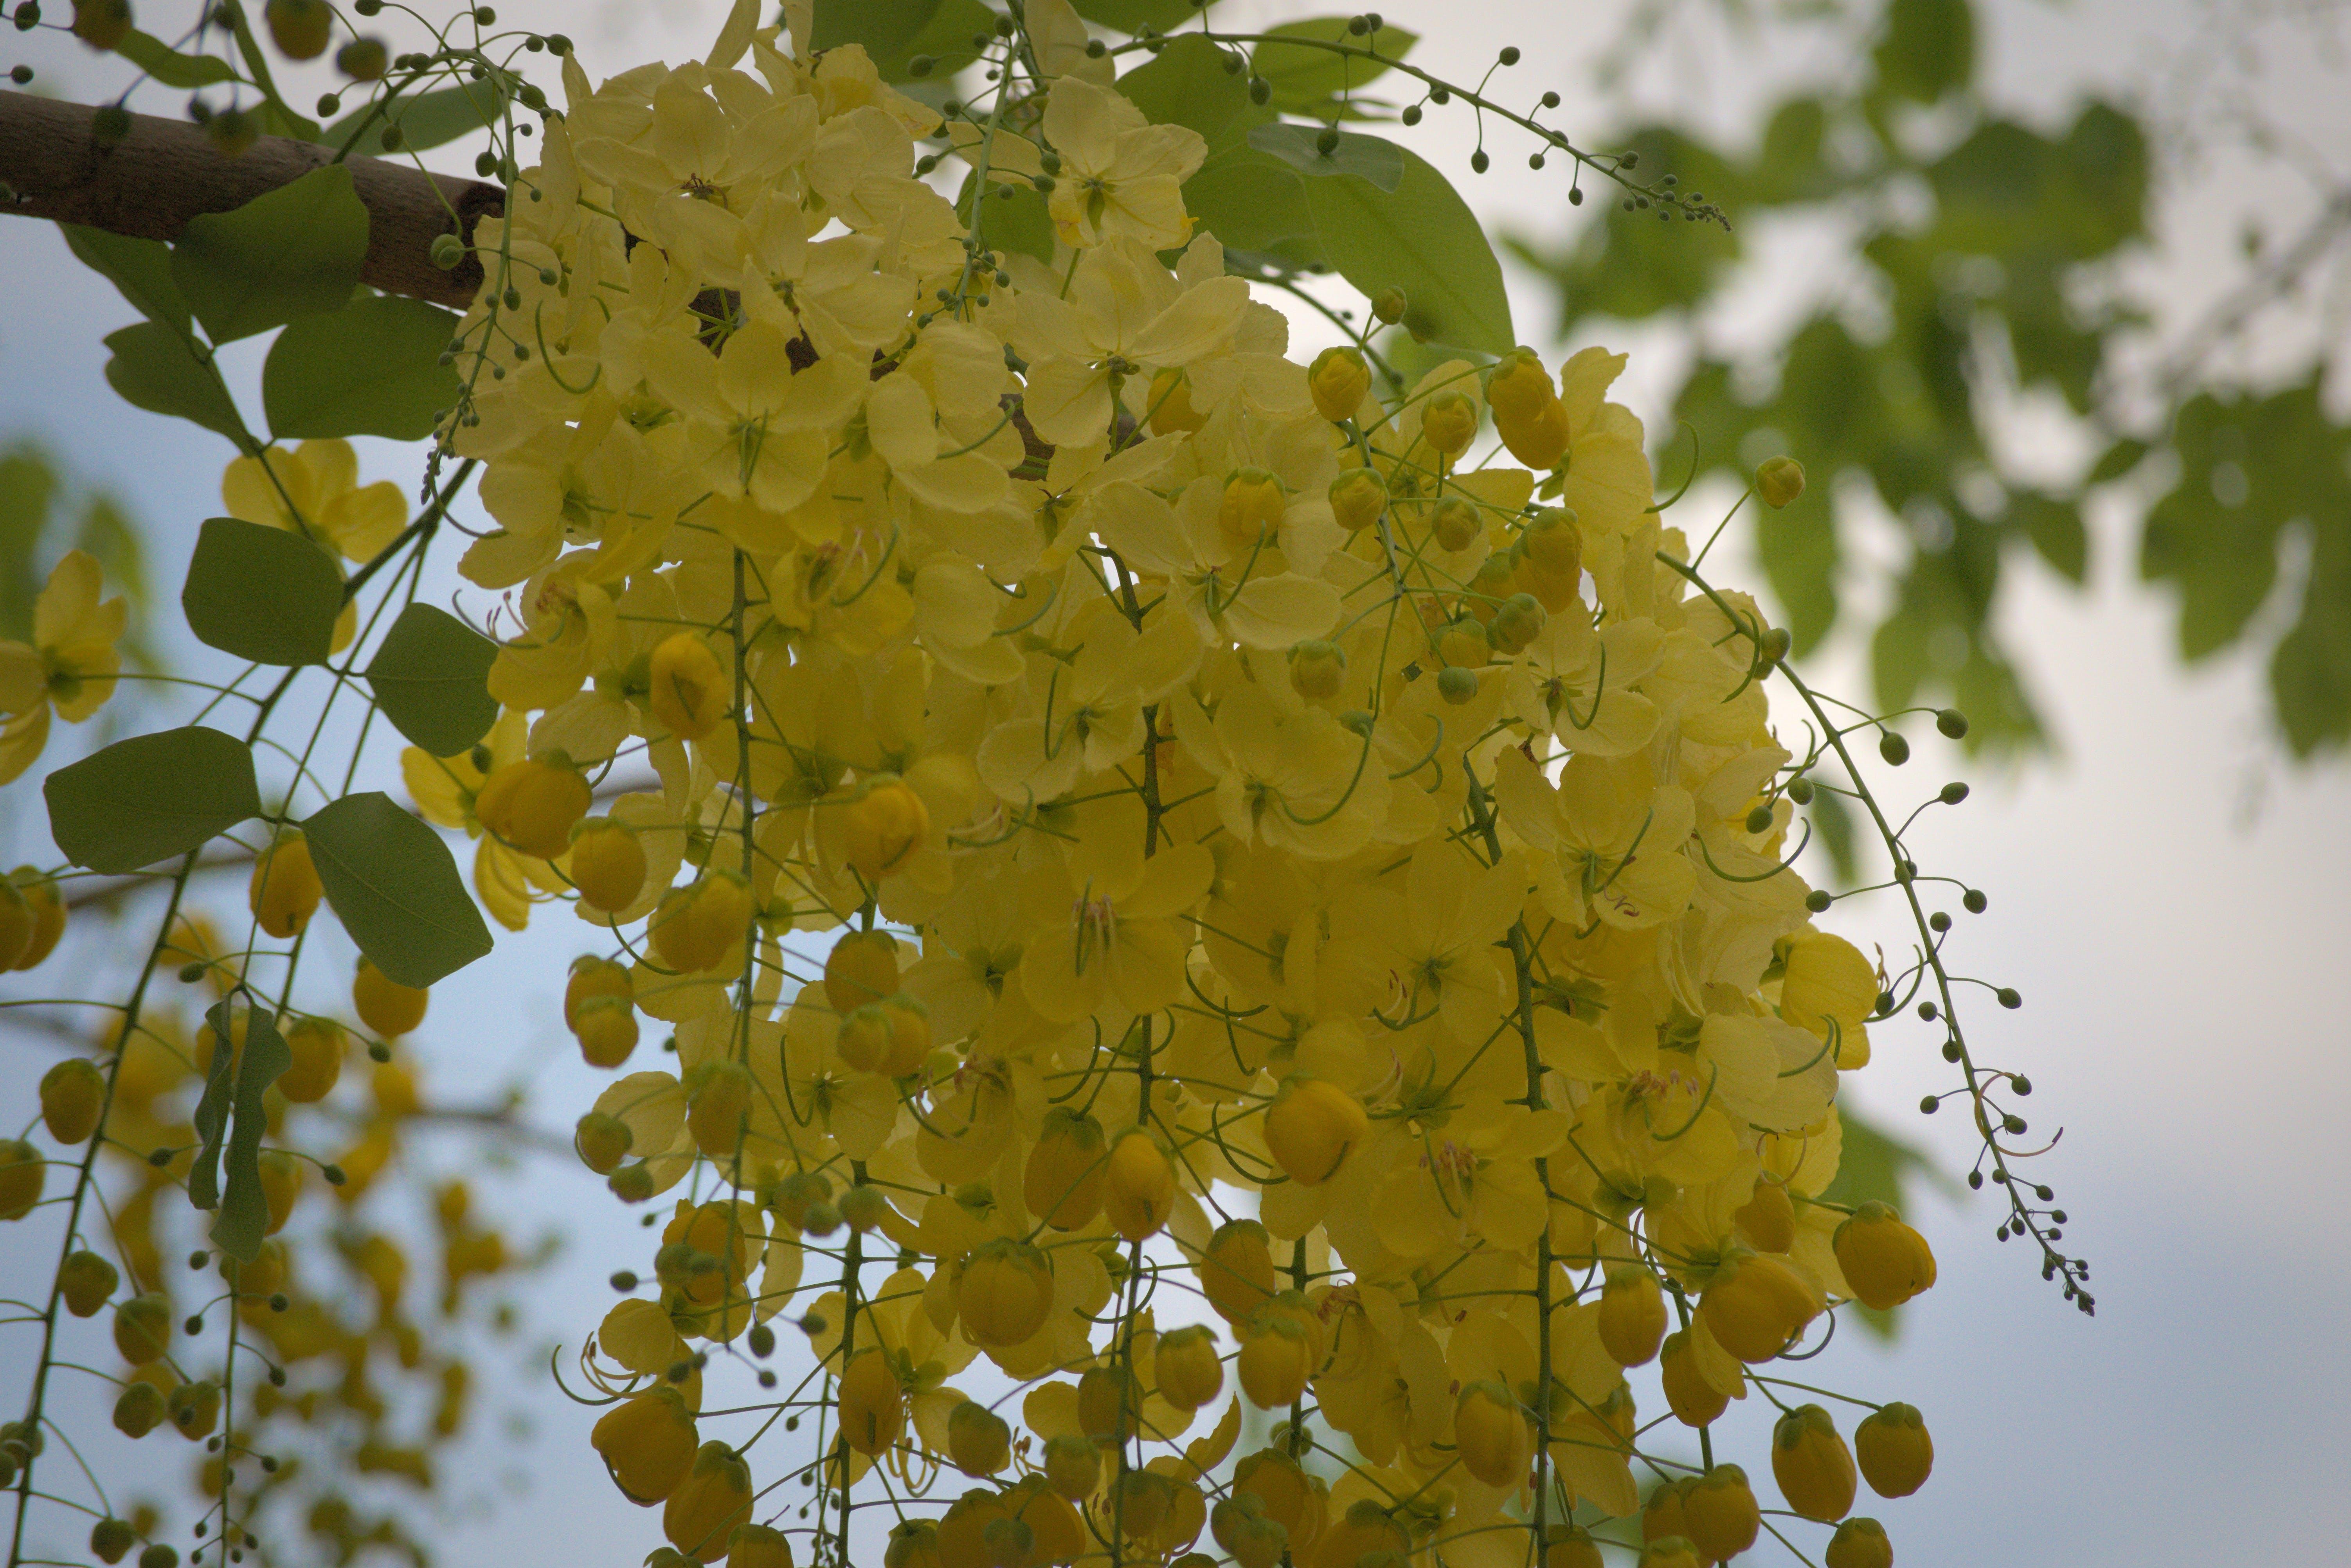 Free stock photo of canafistula, Cassia Fistula, Golden rain tree, Kondrai